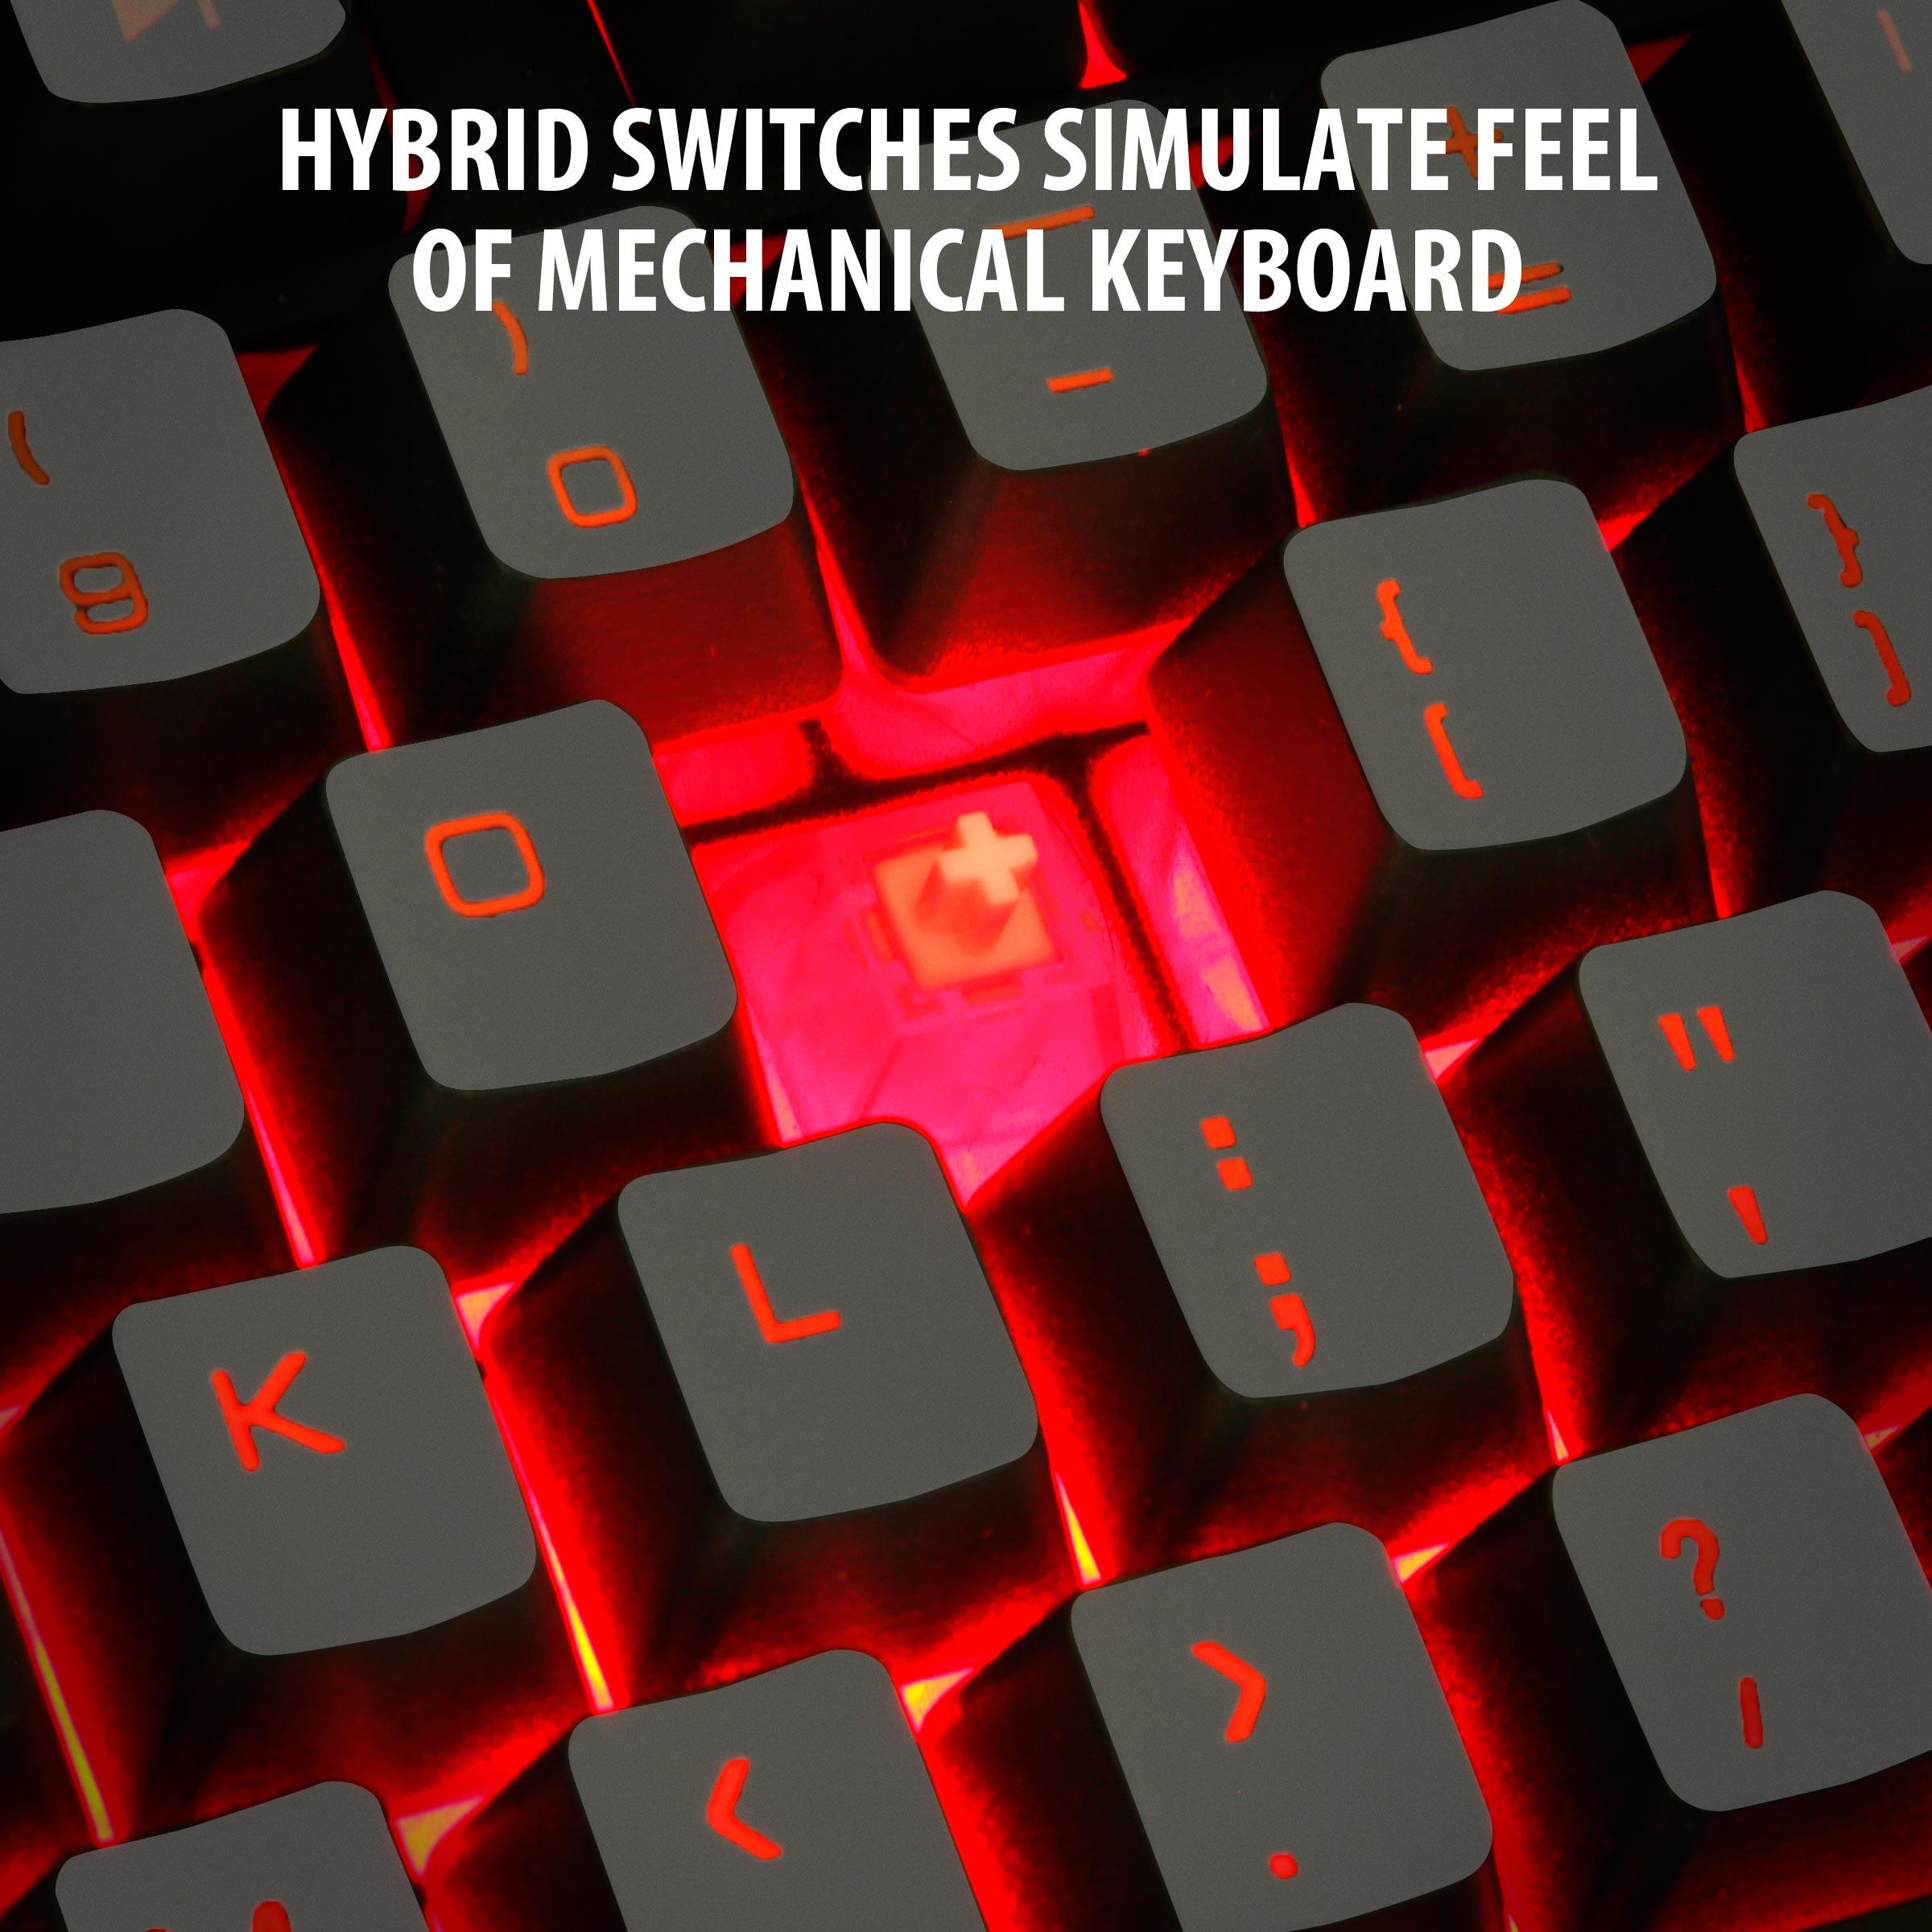 ENHANCE GX-K2 LED Gaming Keyboard with Hybrid Switches , 104+ Keys & 3 Switchable Backlight Colors 3